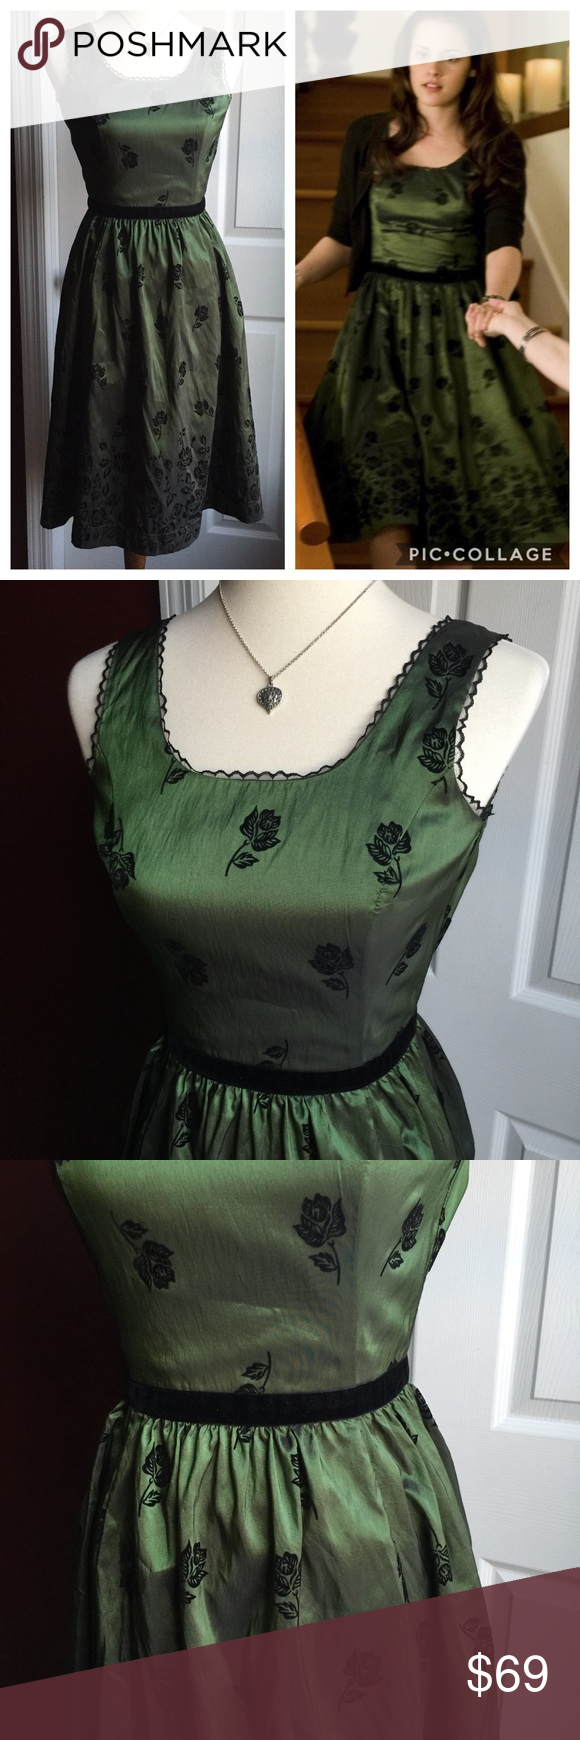 Twilight New Moon Bella Swan Birthday Dress Birthday Dresses Hot Topic Dresses Clothes Design [ 1740 x 580 Pixel ]